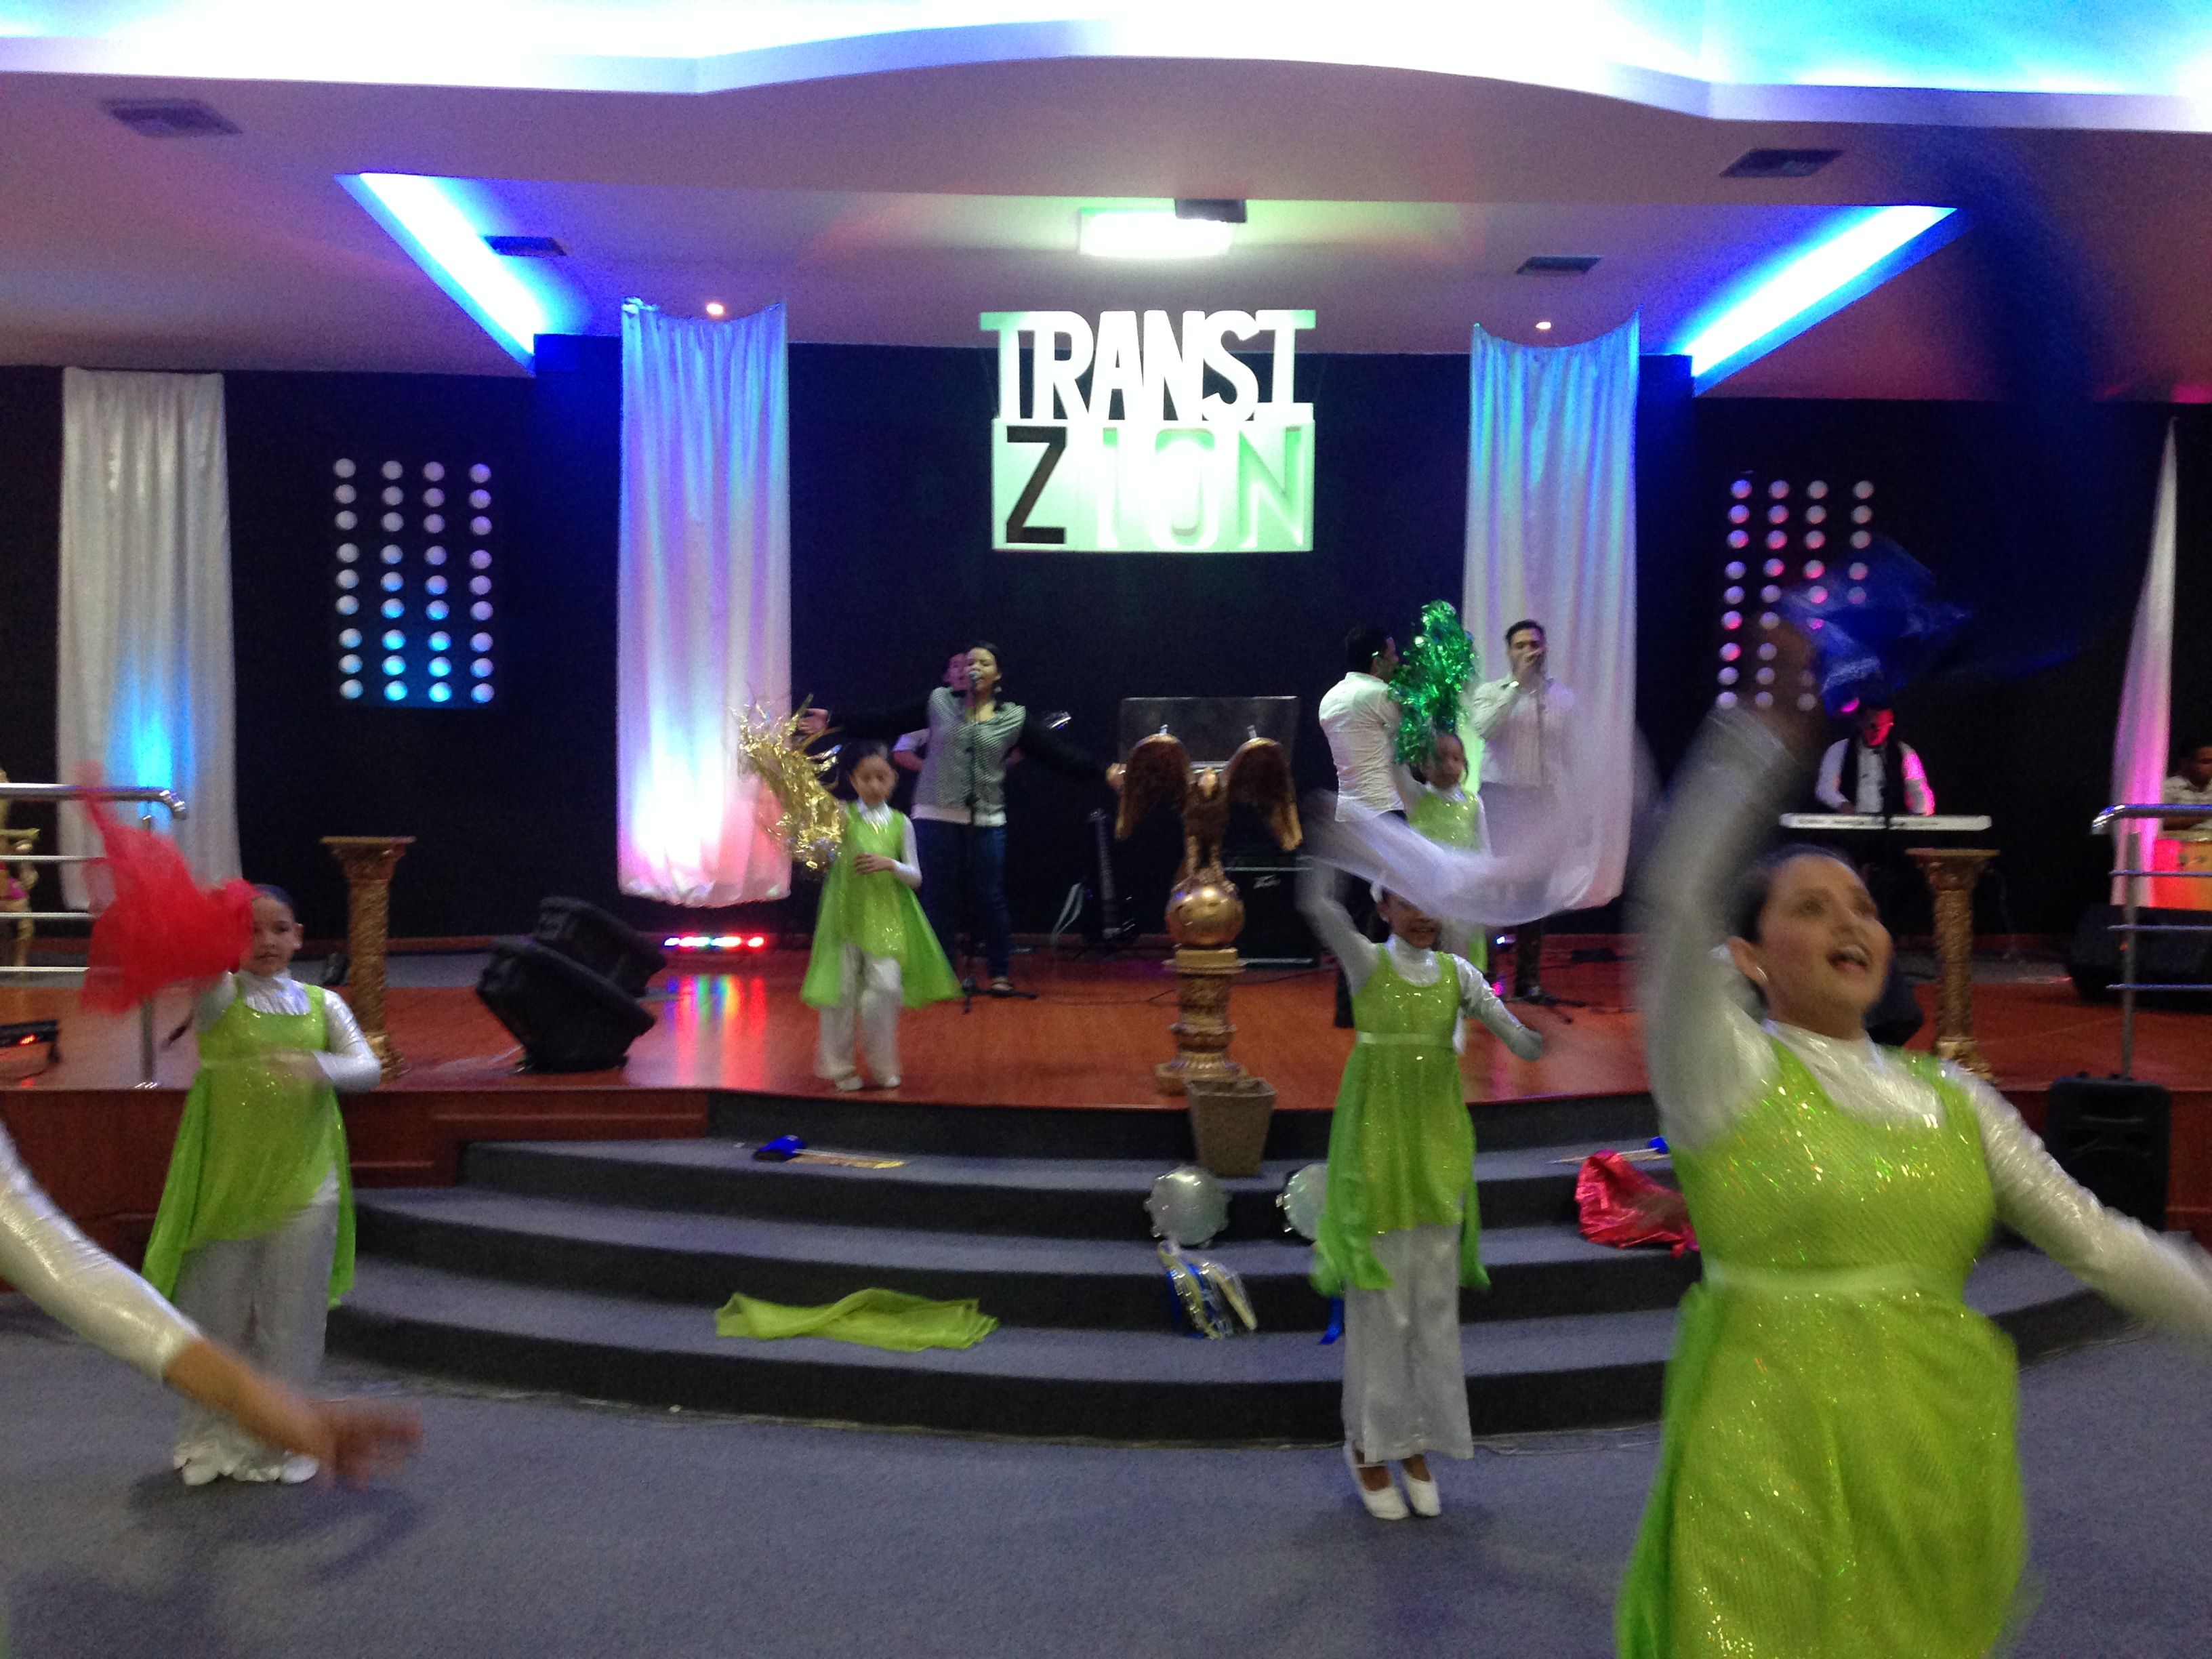 adoración en transcisión